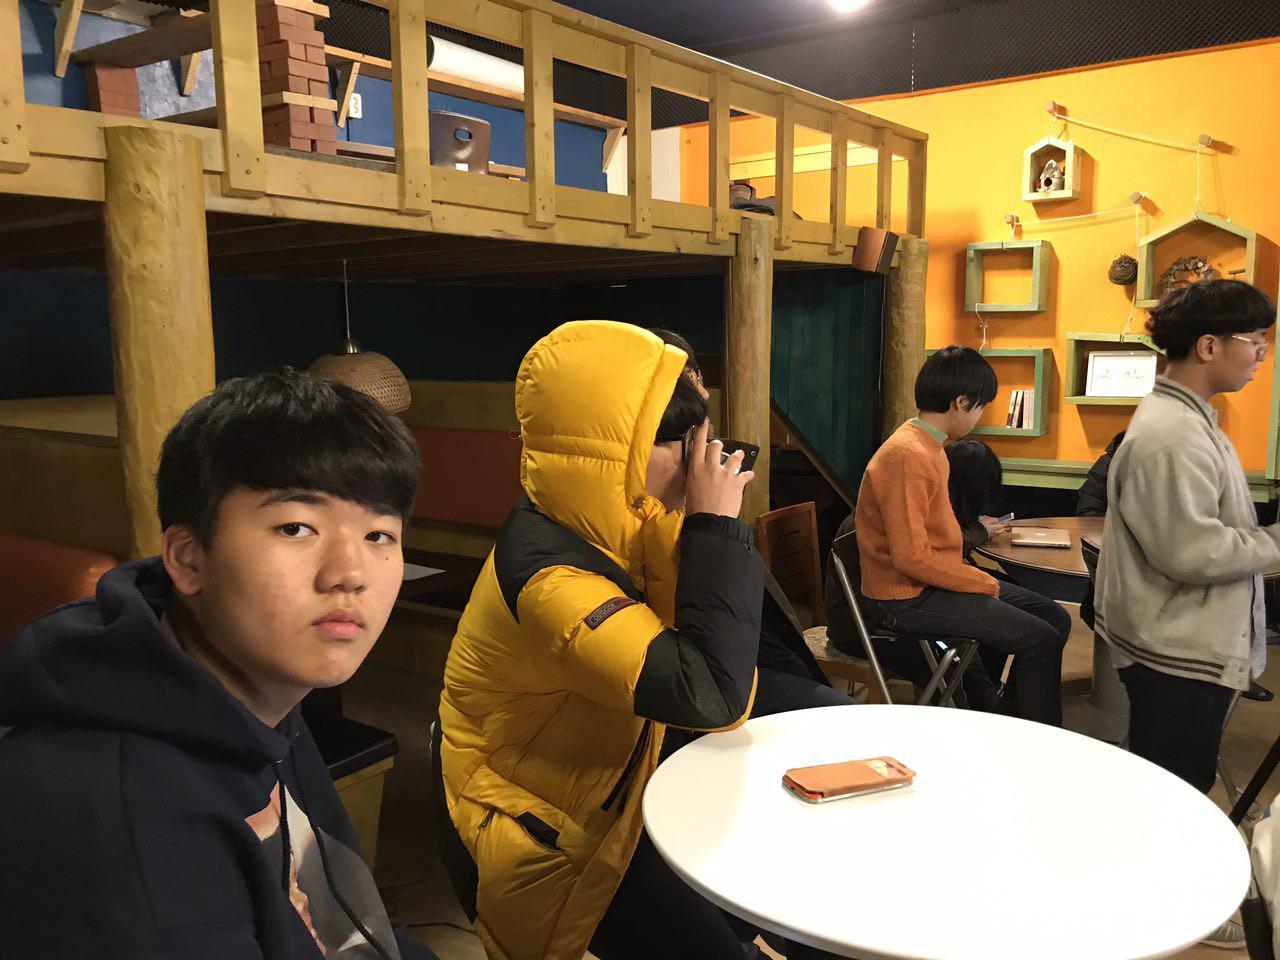 photo_2017-11-08_14-04-48.jpg